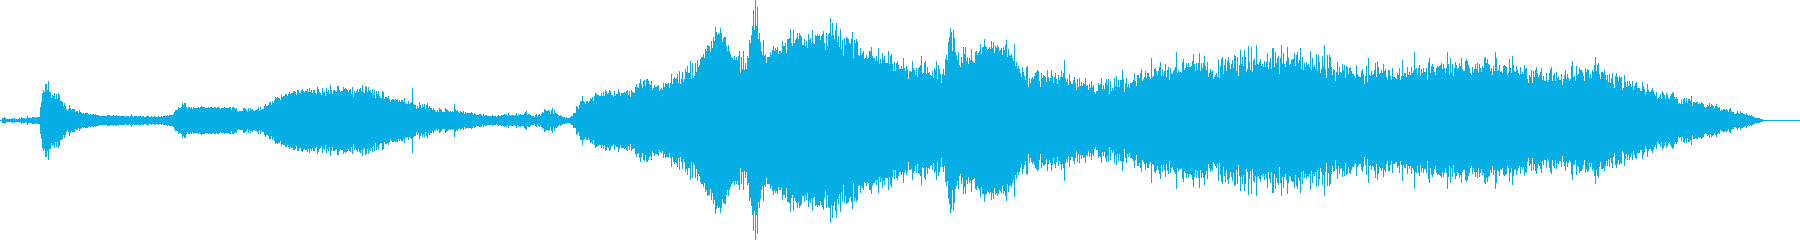 GmキャデラックCts:内線:オン...の再生済みの波形